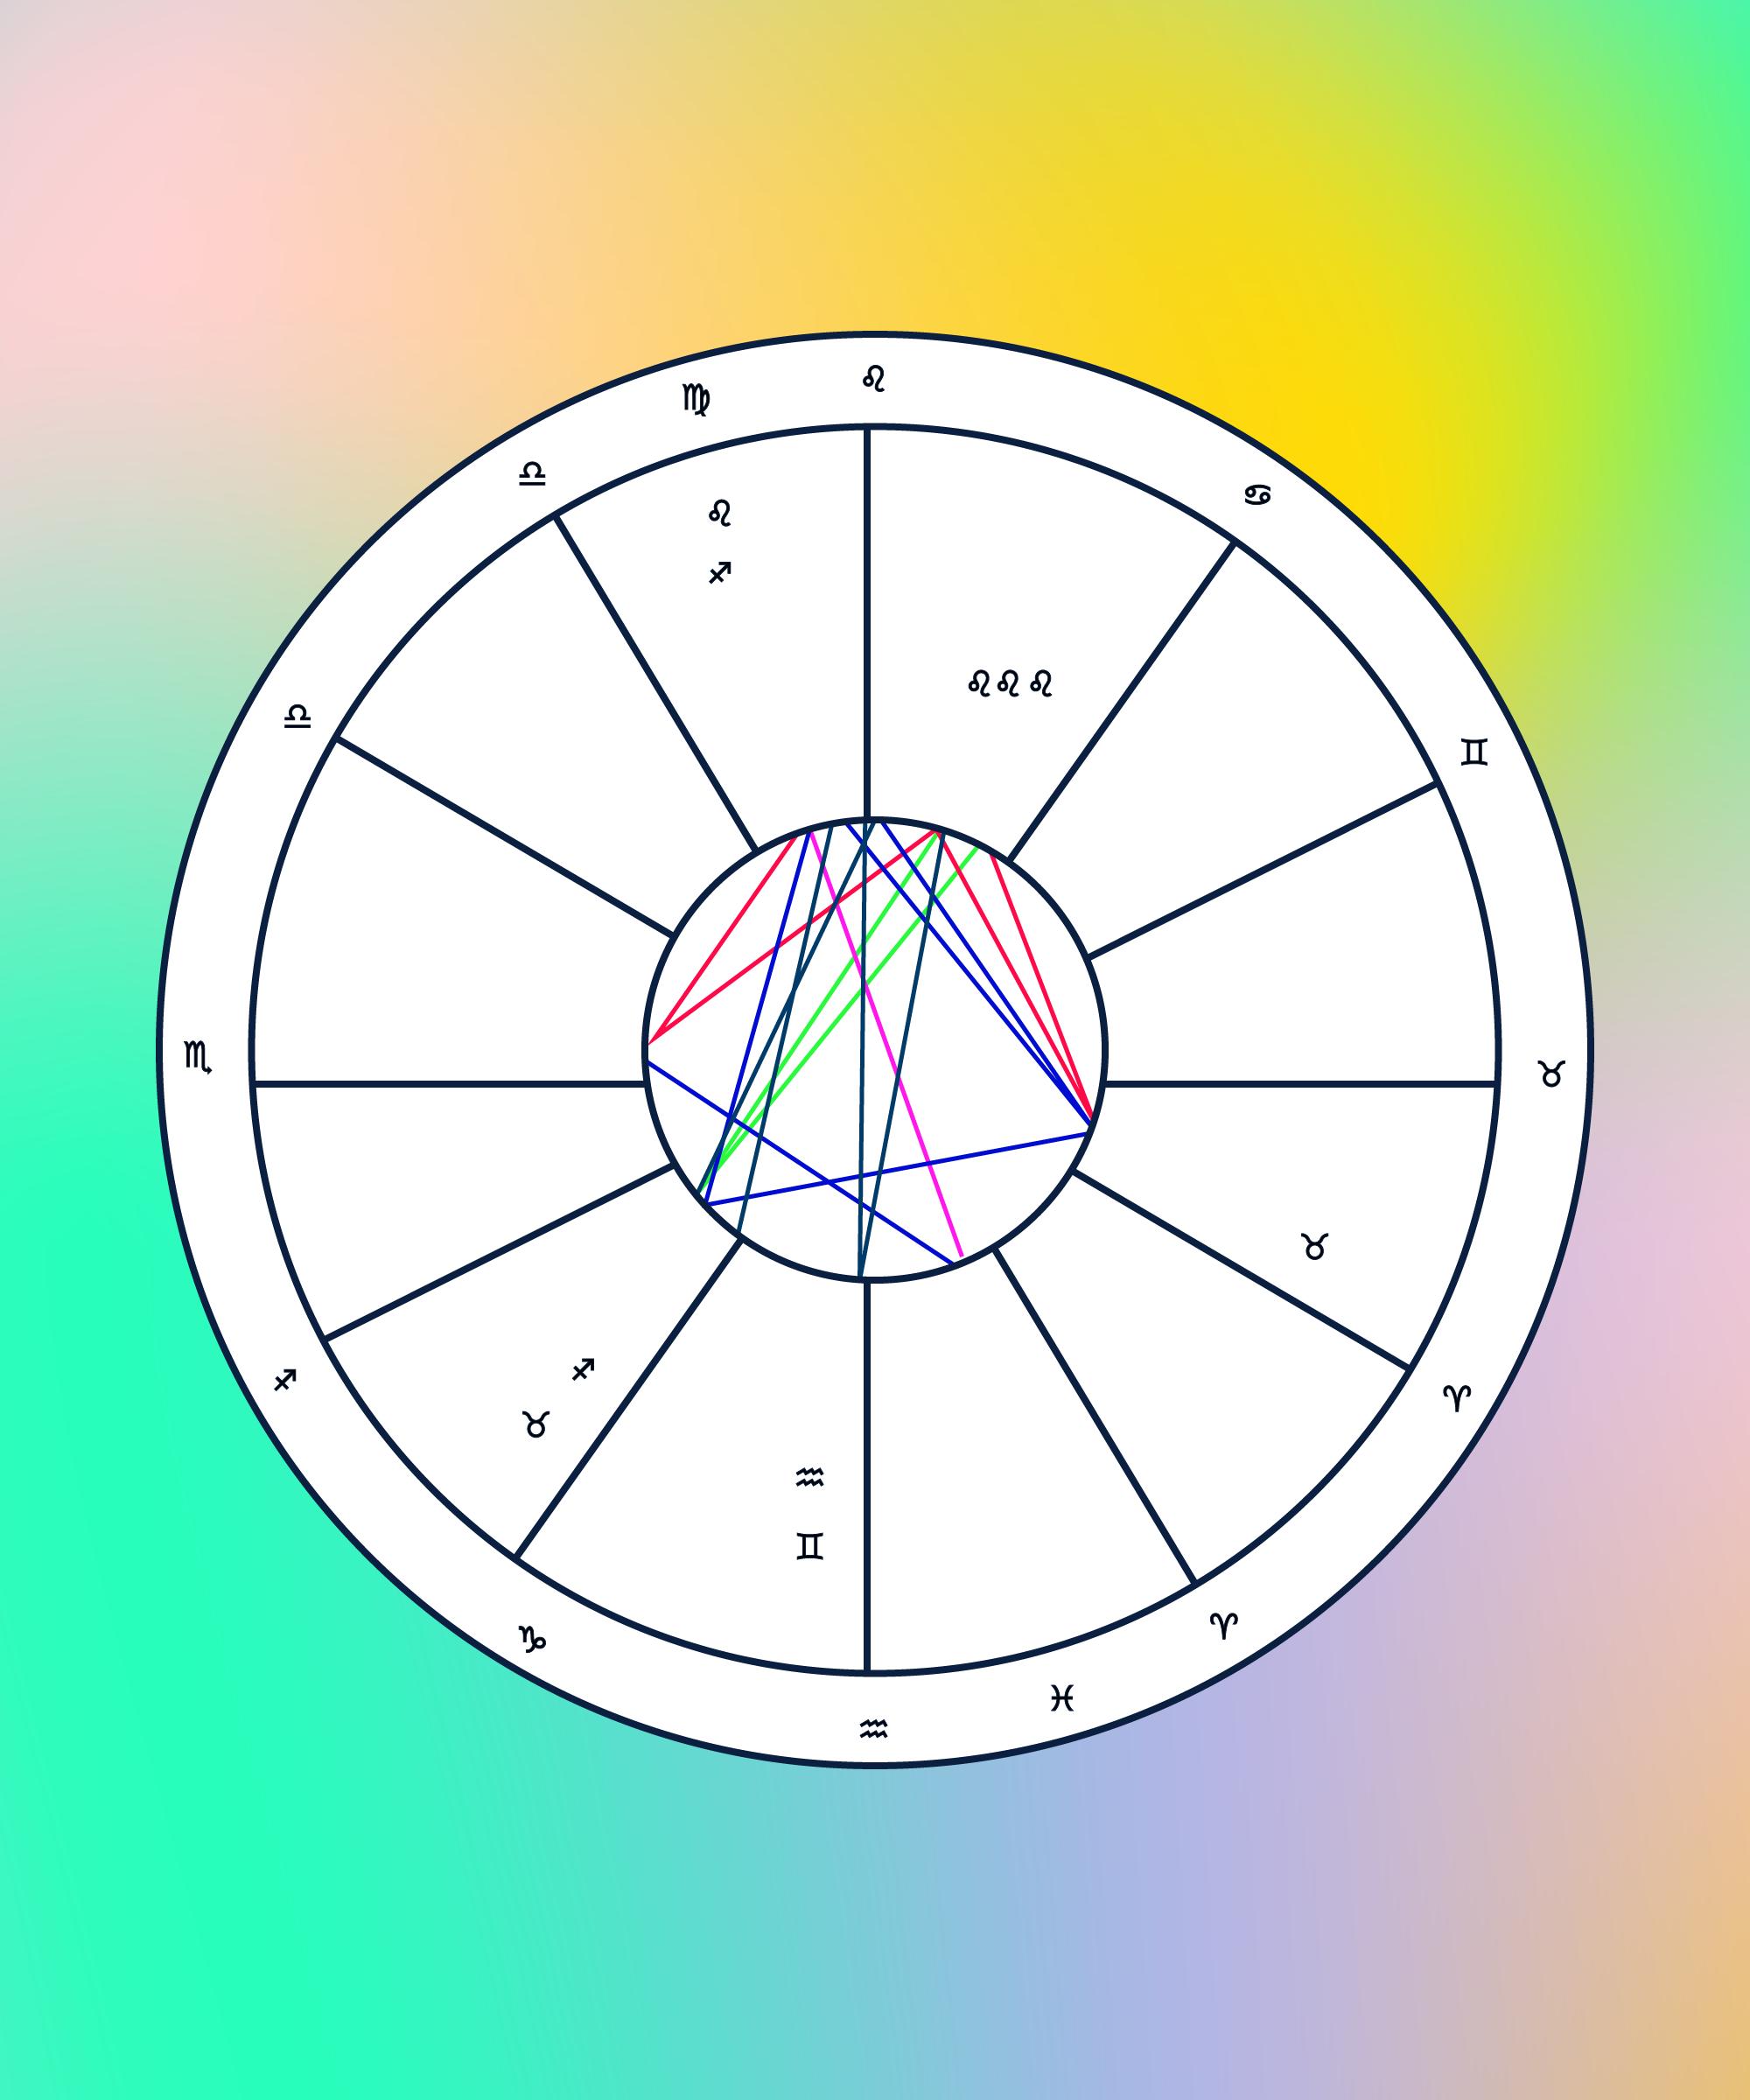 How to make sense of your birth chart birth chart analysis astrology birth chart analysis how to read natal chart nvjuhfo Gallery